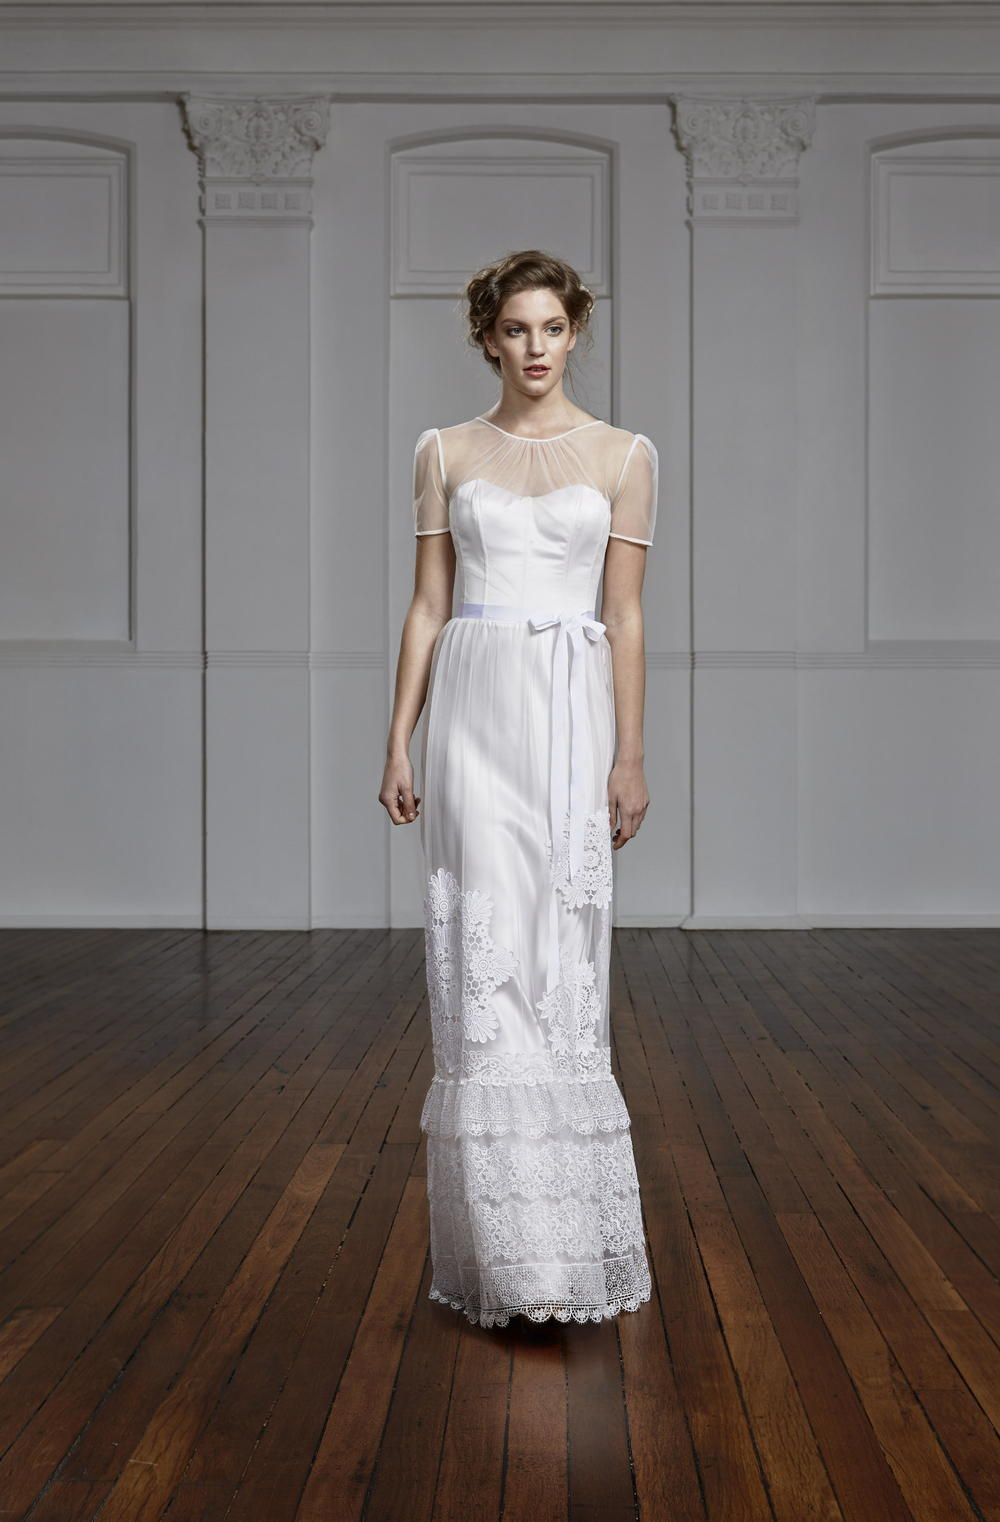 LuceDelSole-Vintage bridal design_TanyaAnic_©GrantSparkesCarroll_201a.jpg